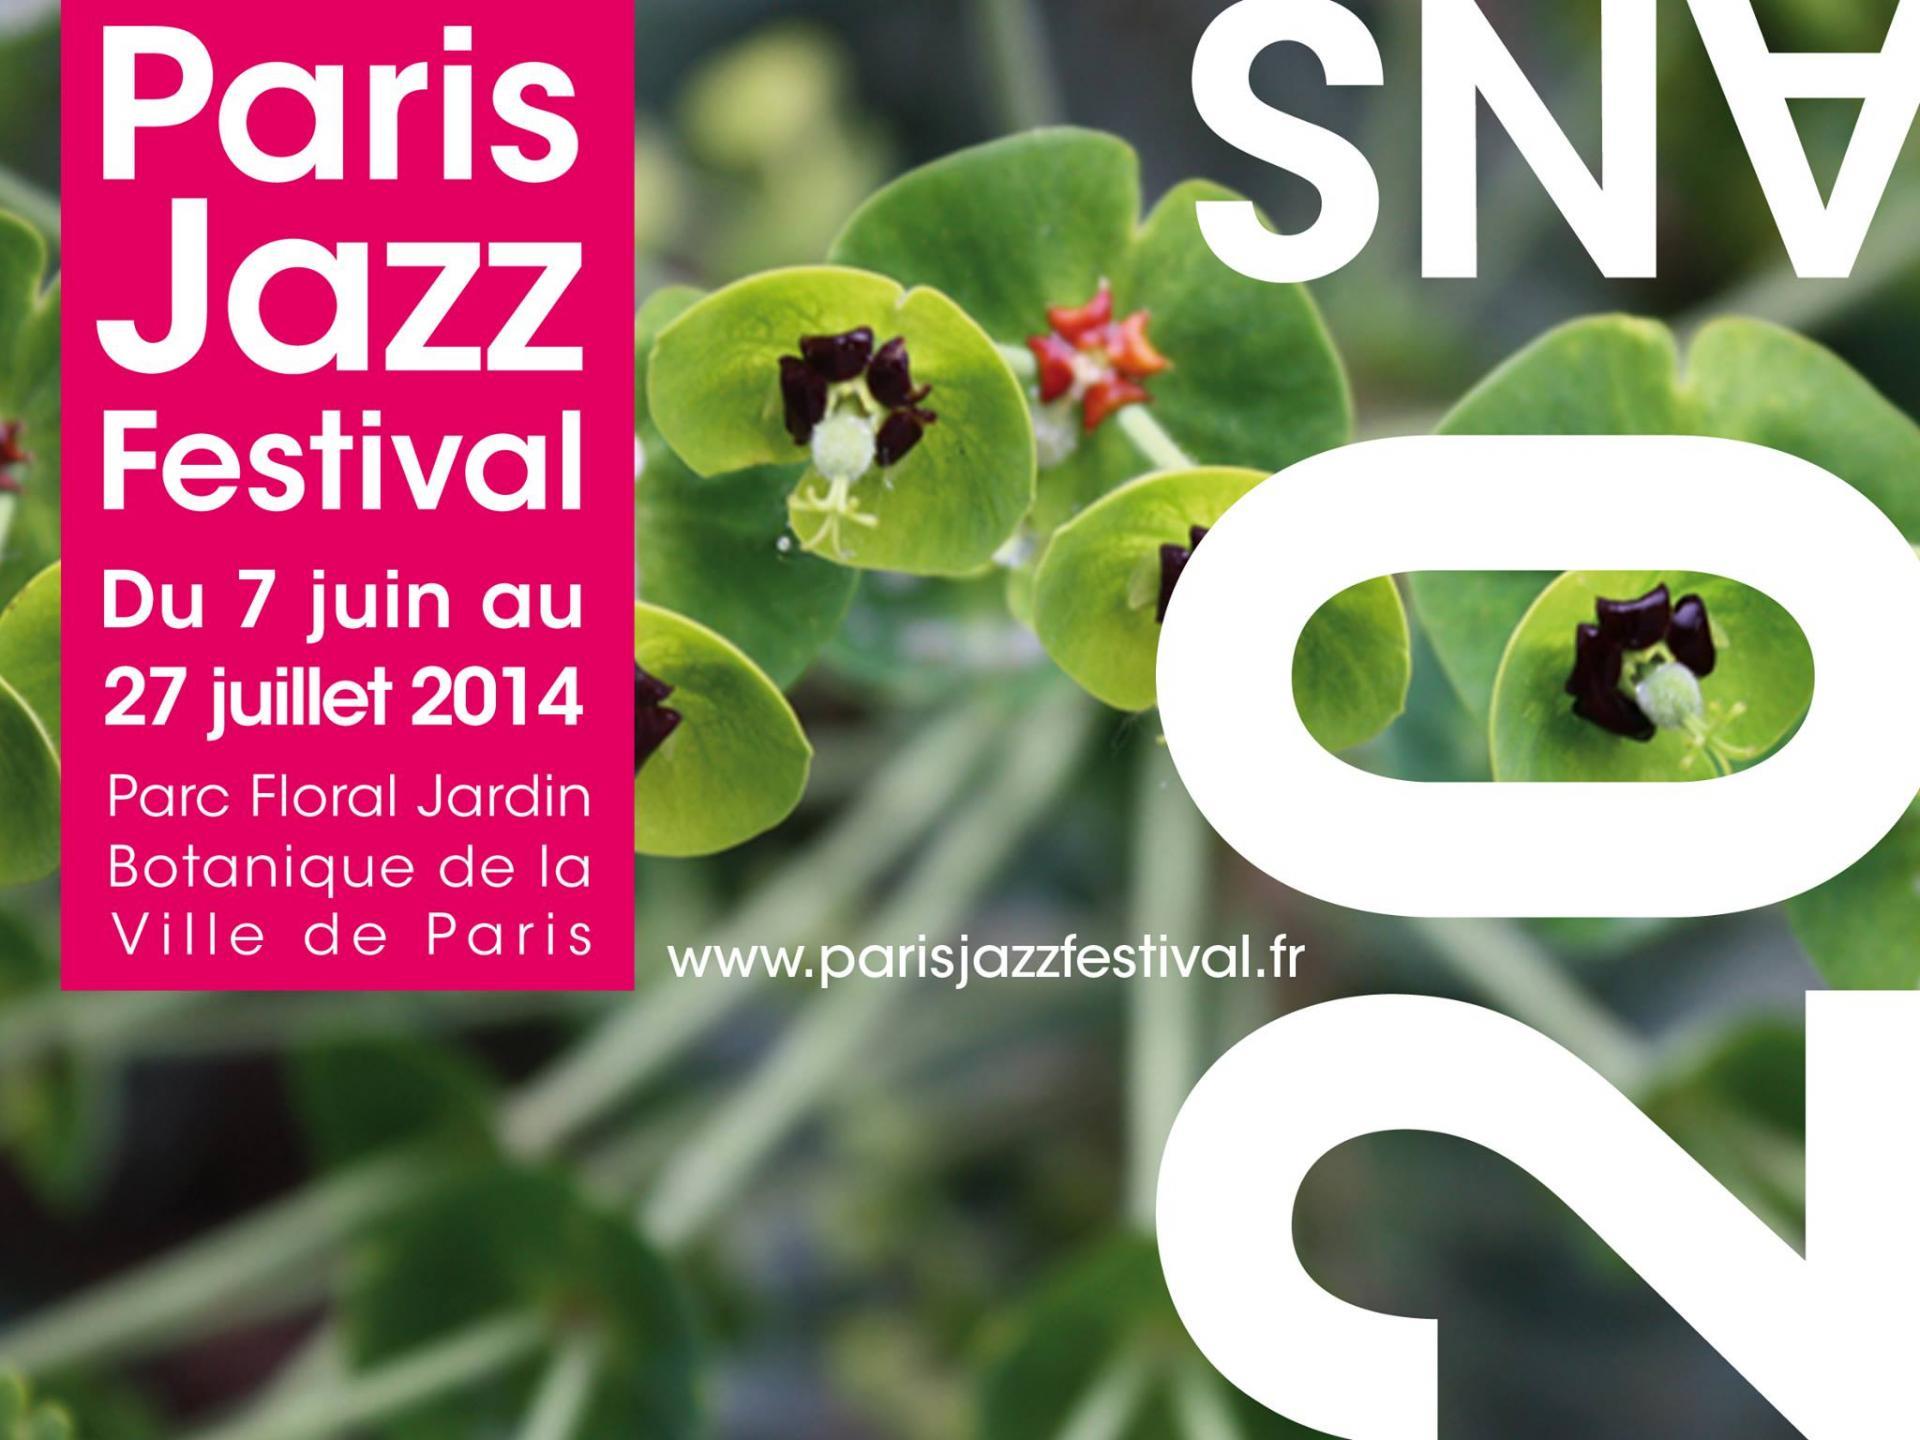 Parisjazzfestival2014